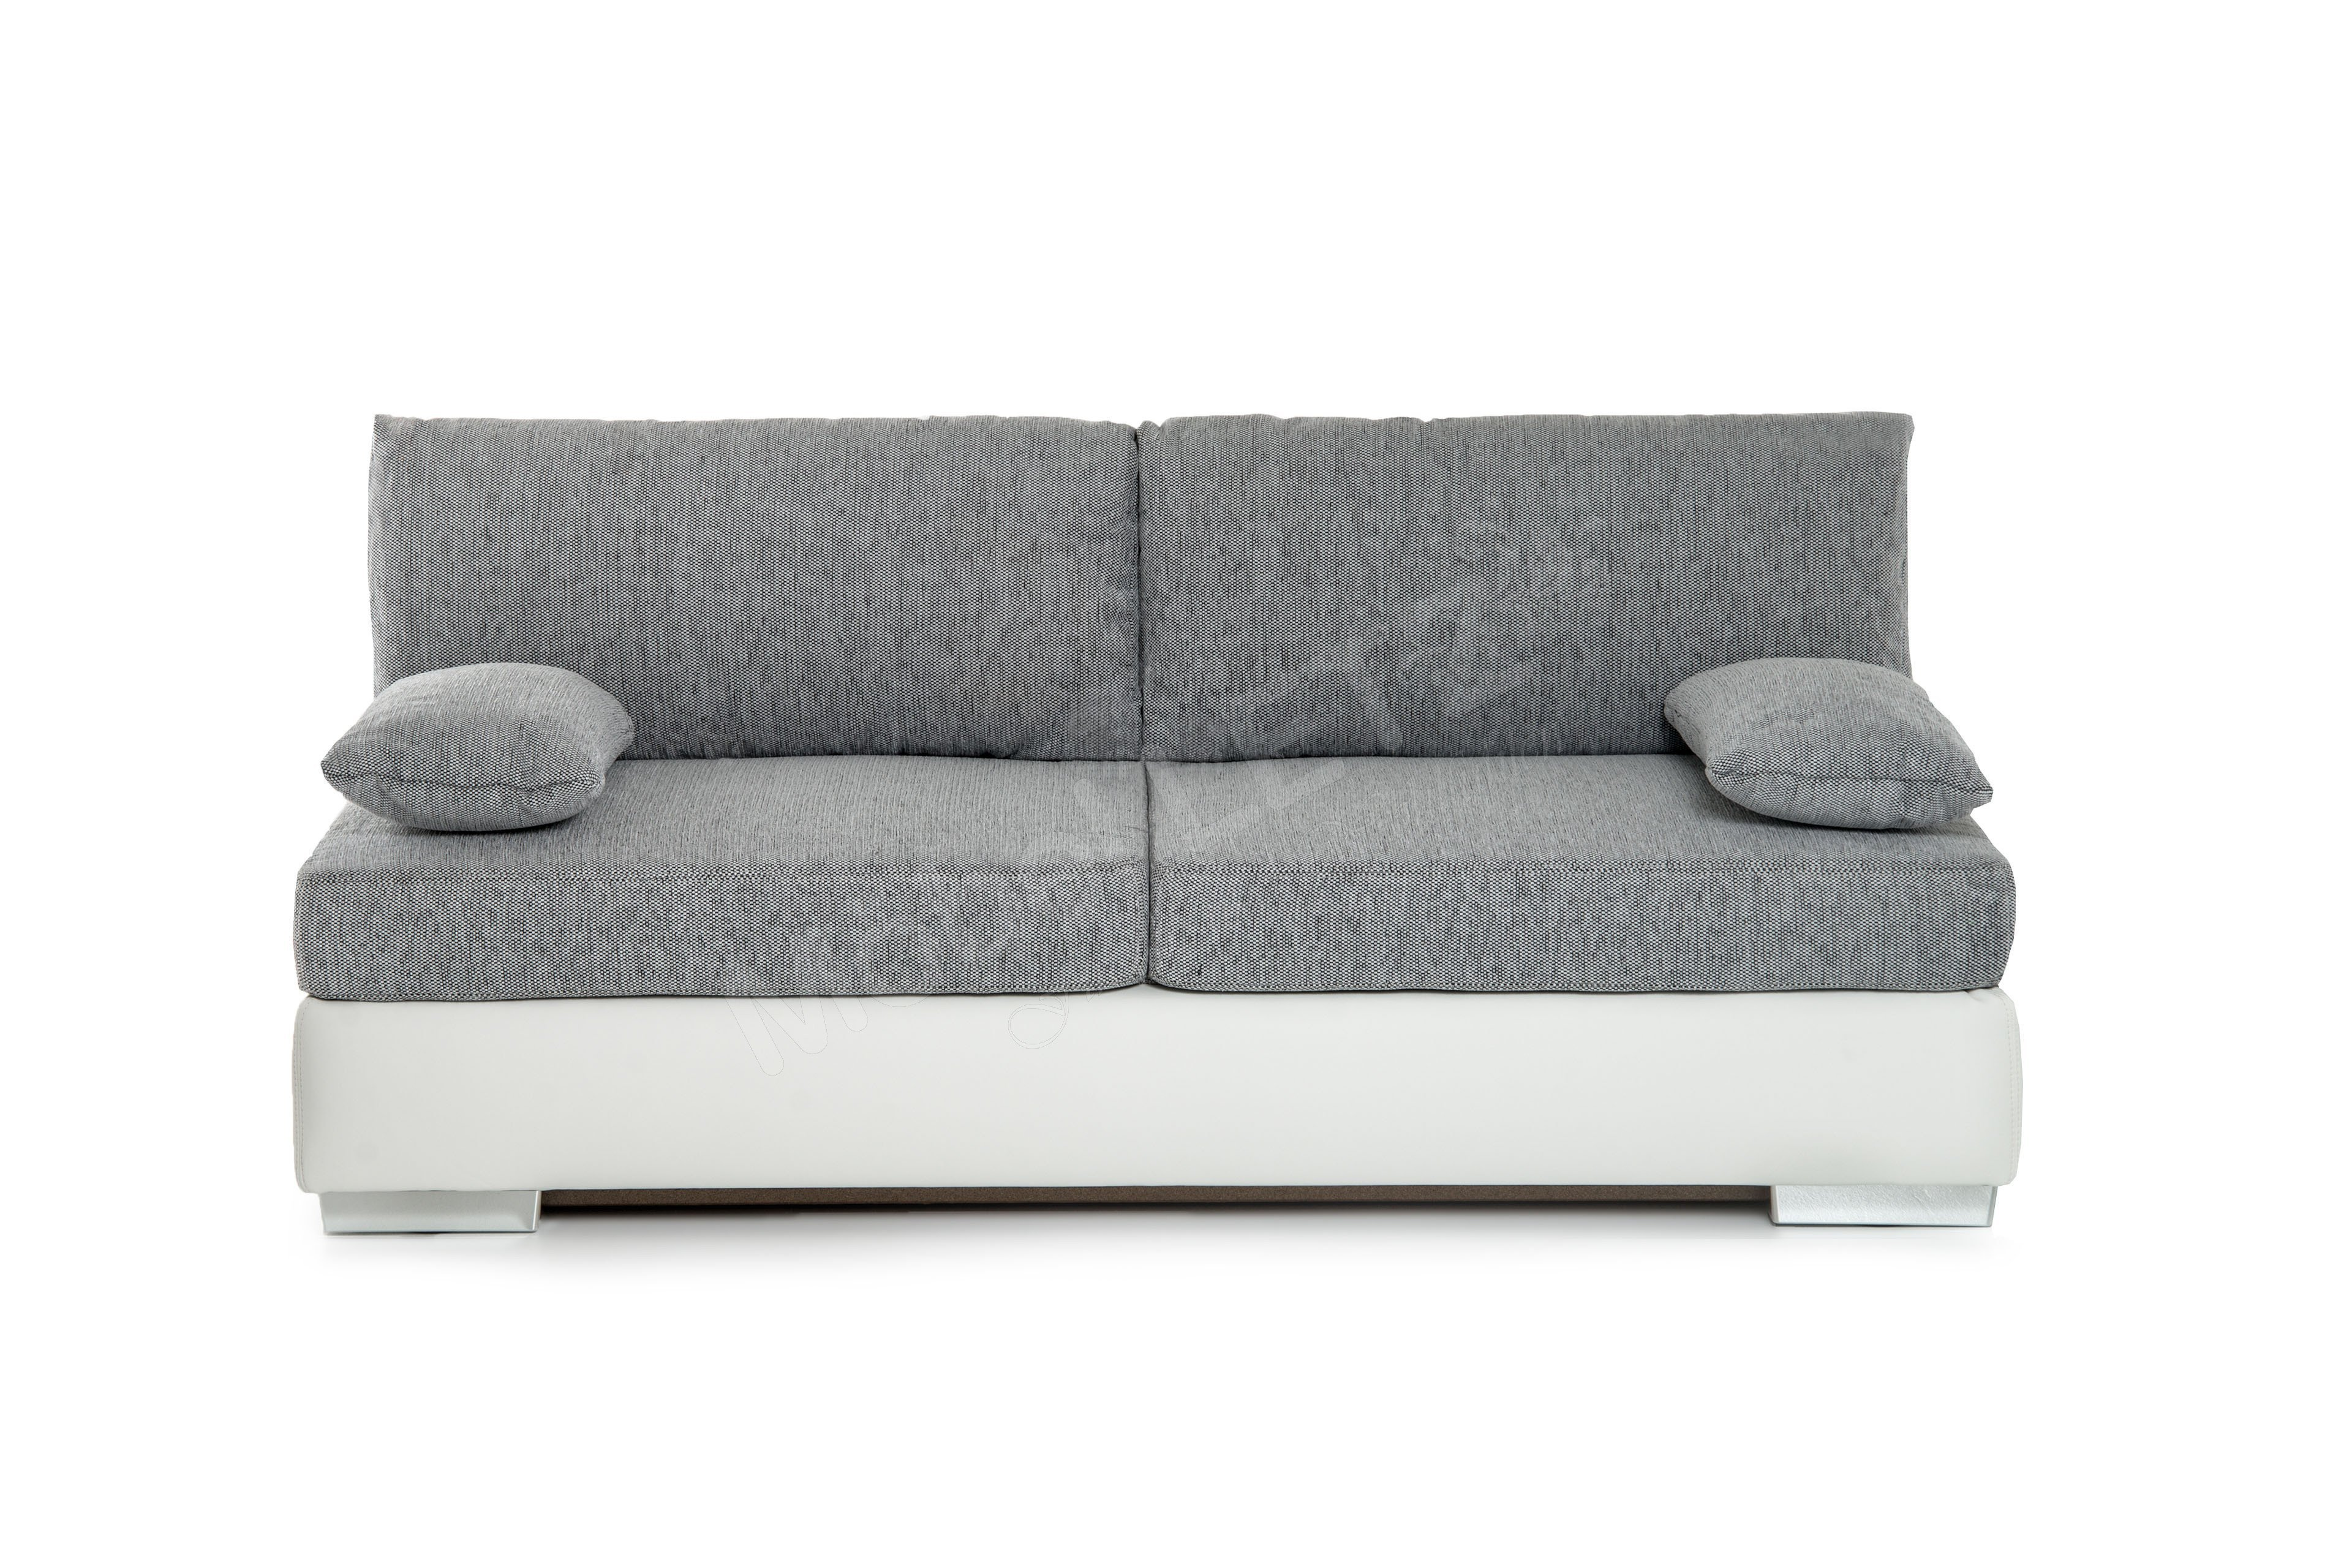 jockenh fer schlafsofa dorset in wei grau m bel letz ihr online shop. Black Bedroom Furniture Sets. Home Design Ideas